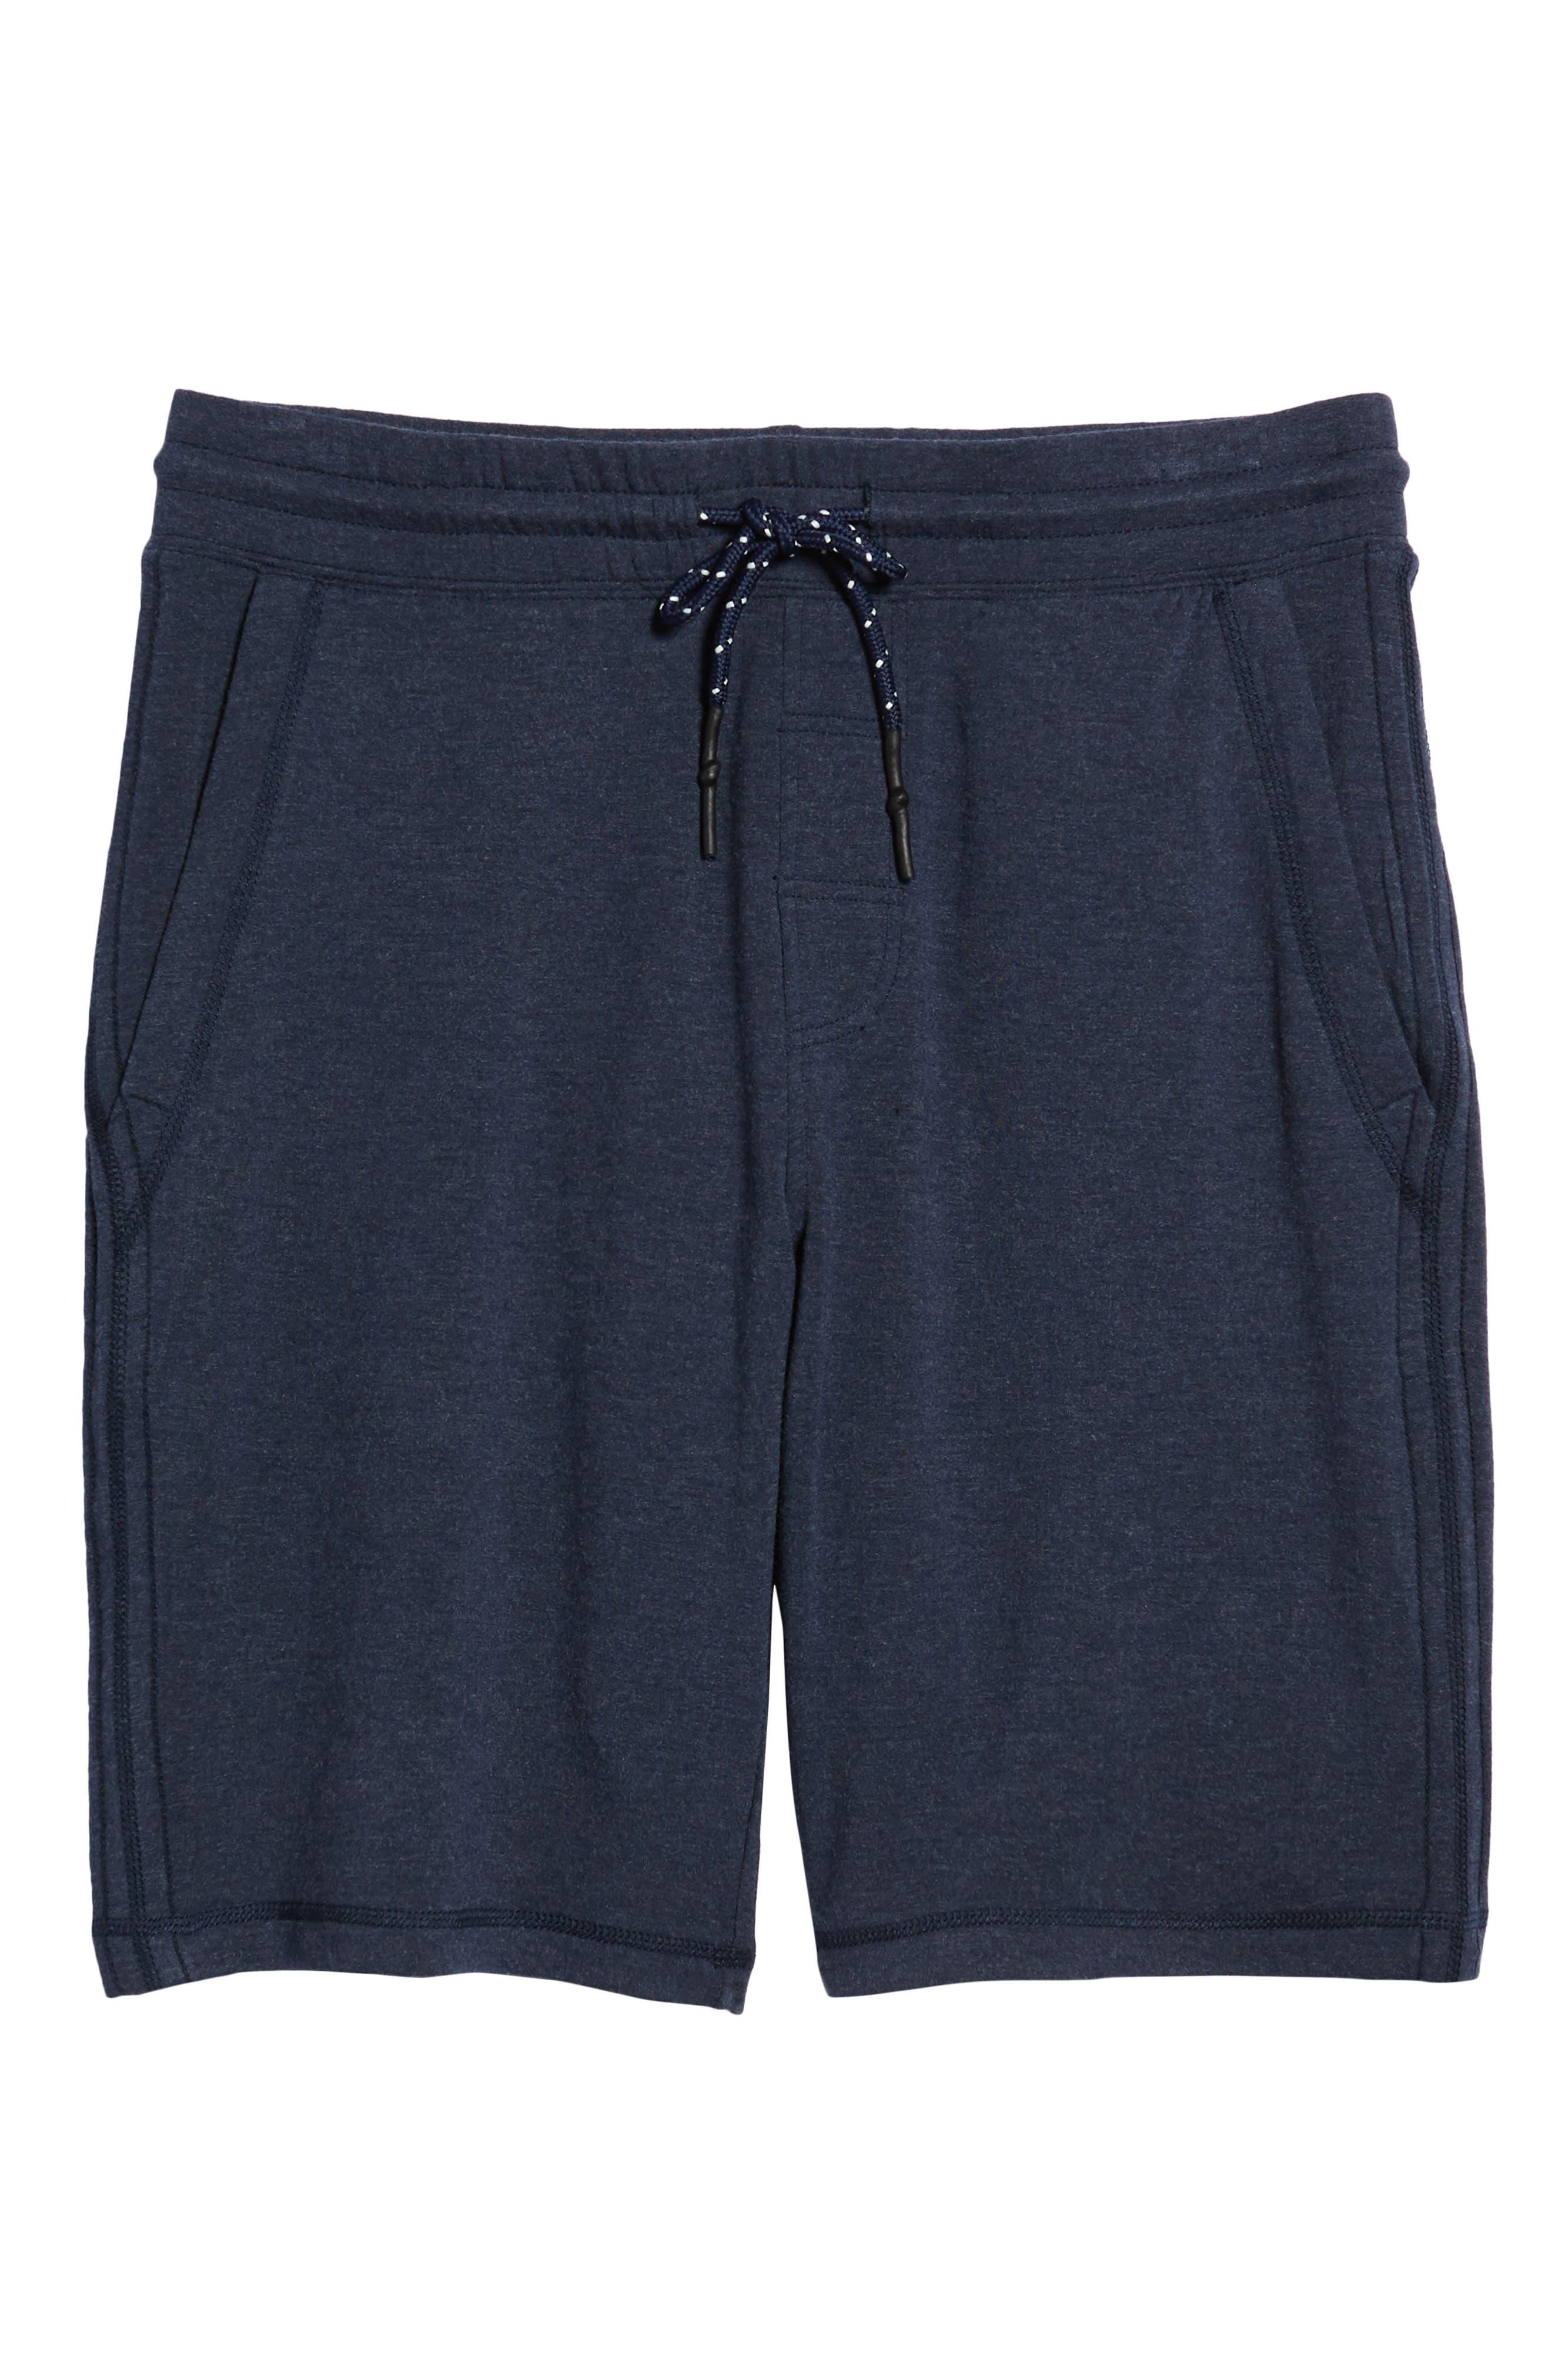 Brushback Fleece Shorts,                             Alternate thumbnail 6, color,                             Navy Heather